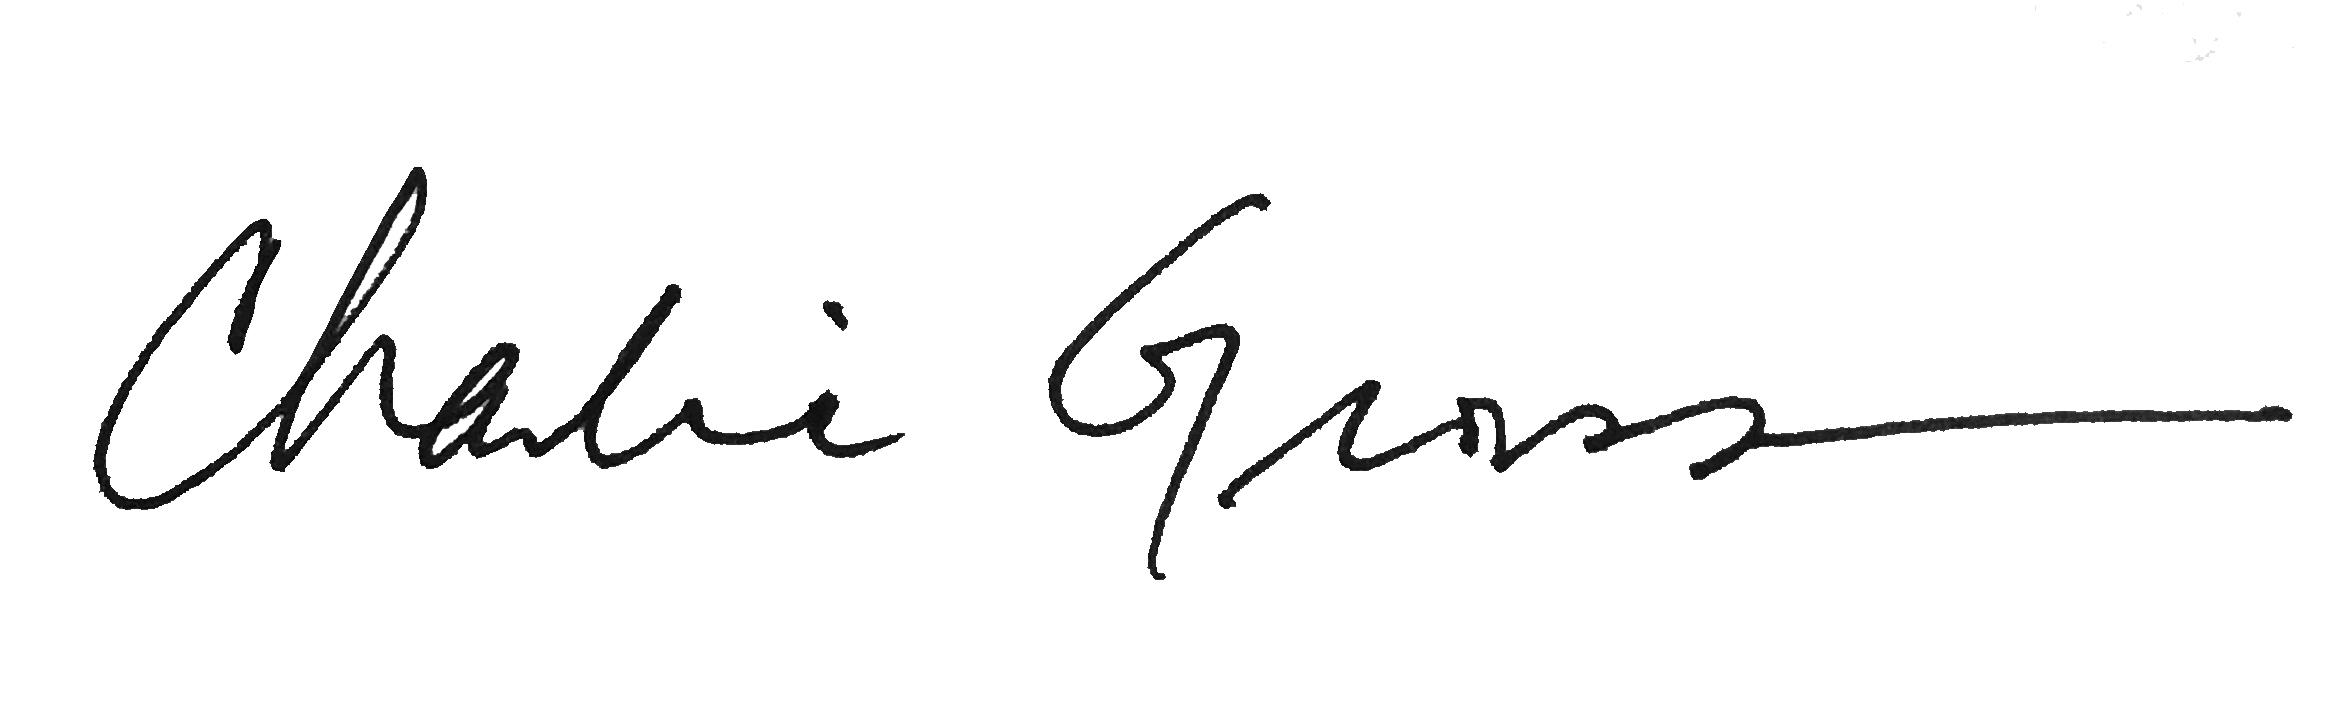 charliegrosso_signature.jpg